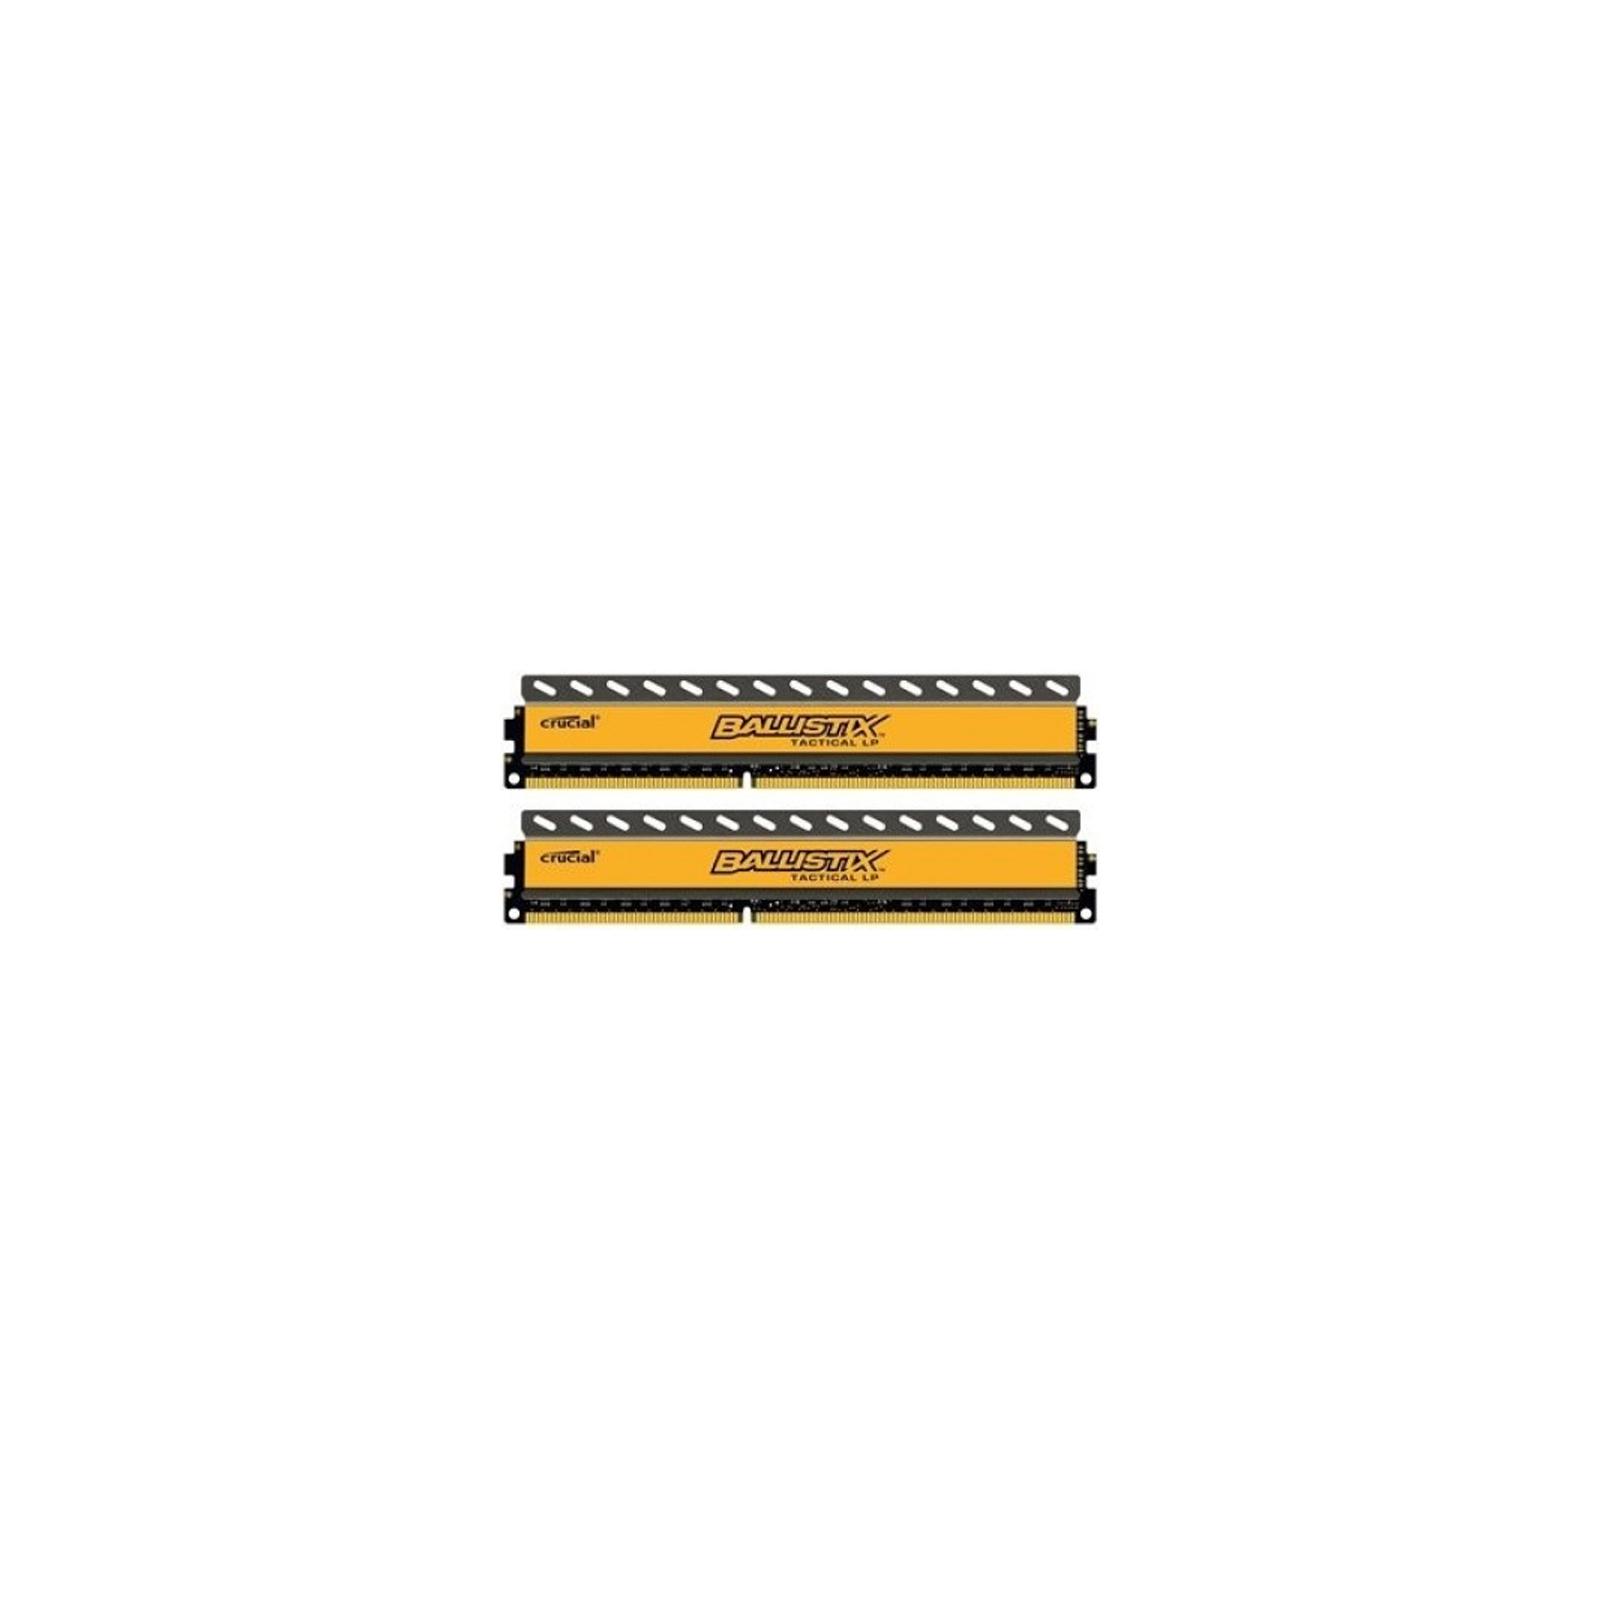 Модуль памяти для компьютера DDR3 16GB (2x8GB) 1600 MHz BallistiX Tactical MICRON (BLT2C8G3D1608ET3LX0CEU)